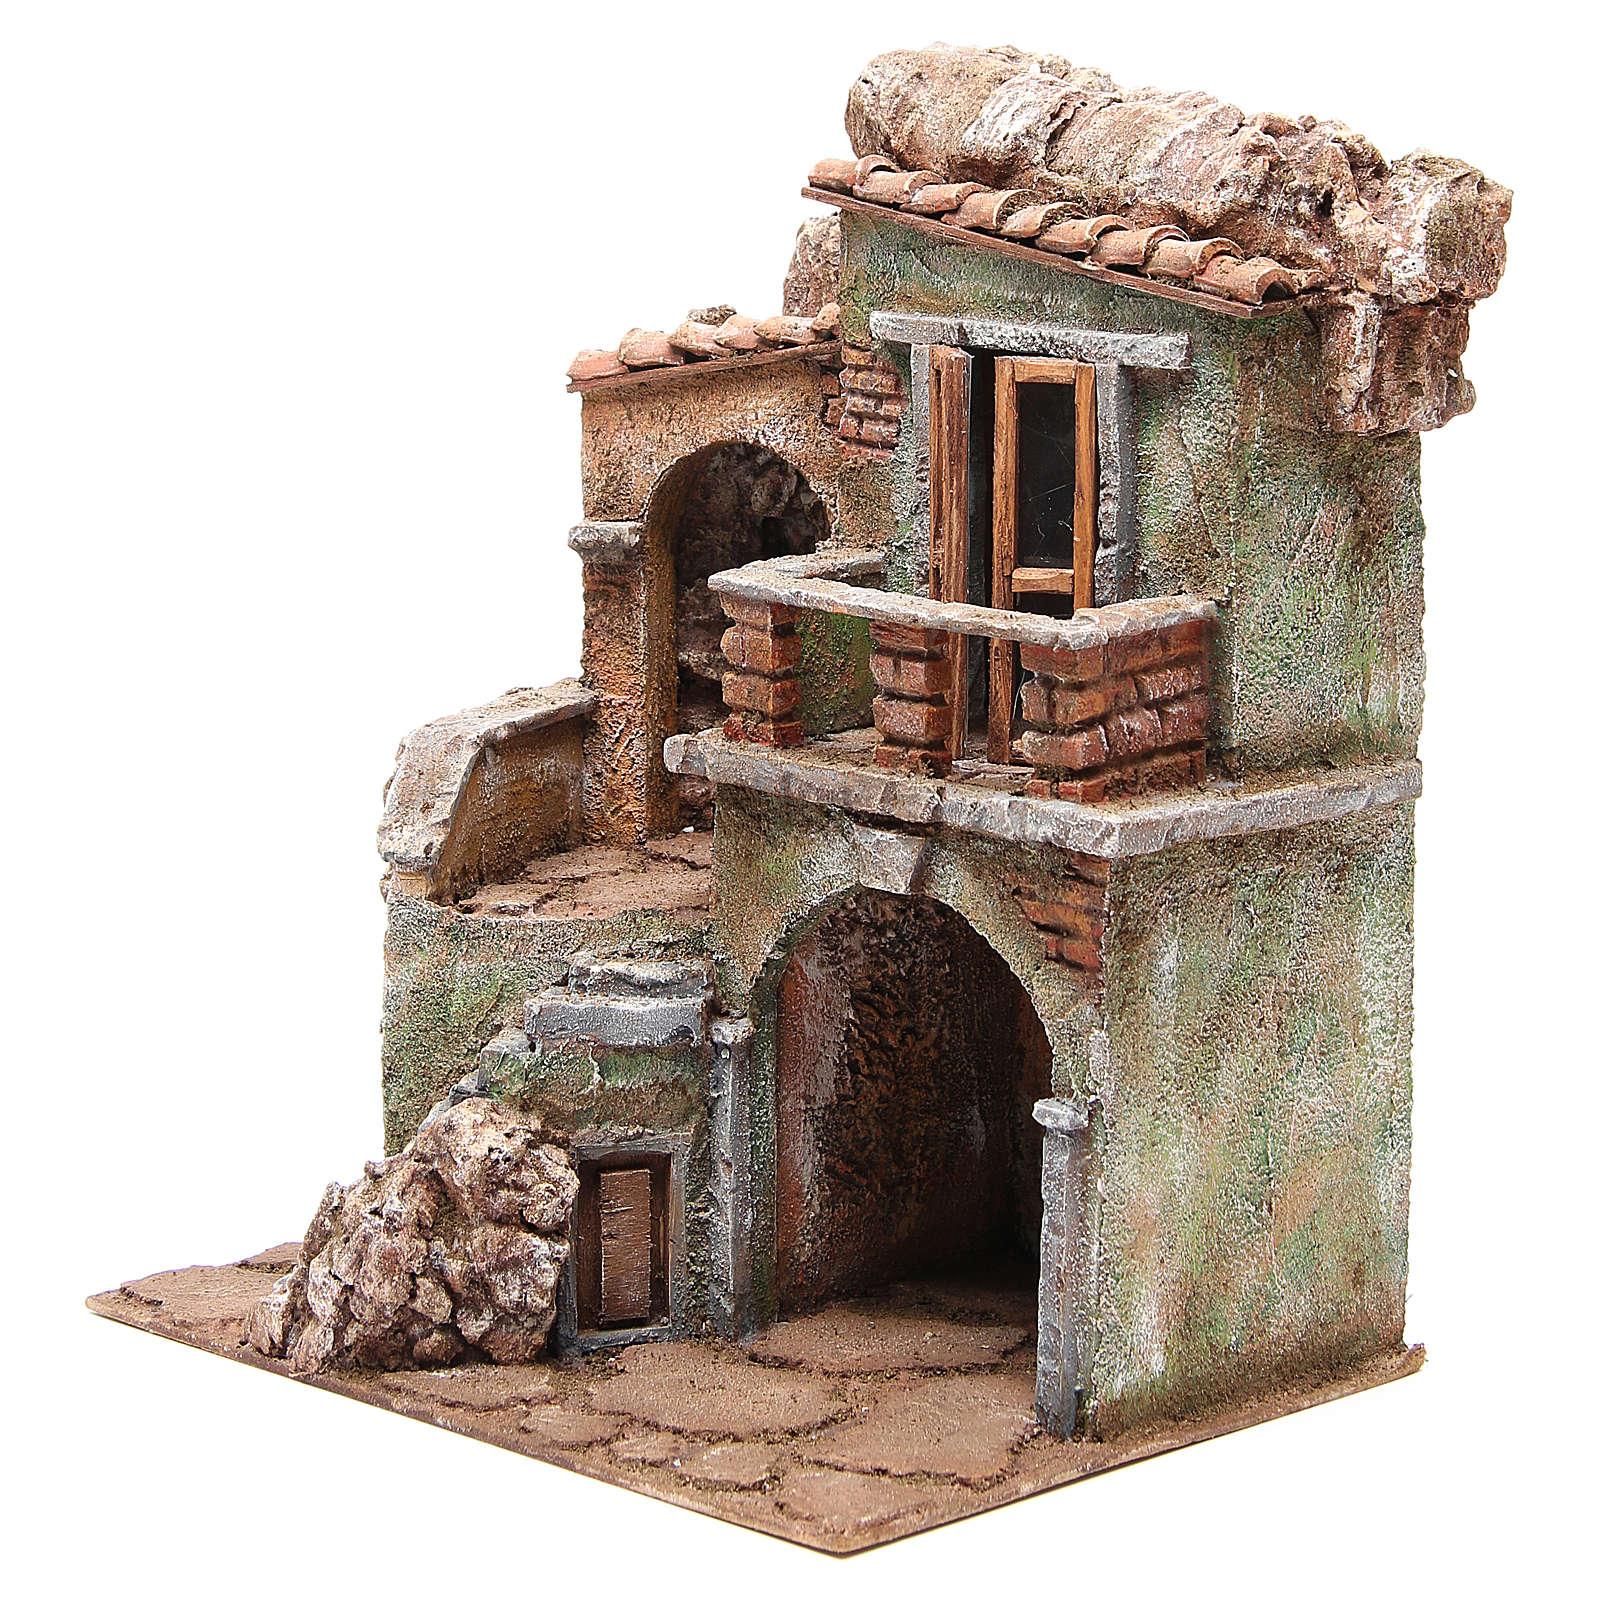 Casa con capanna del presepe cm 35x29x22 cm 4